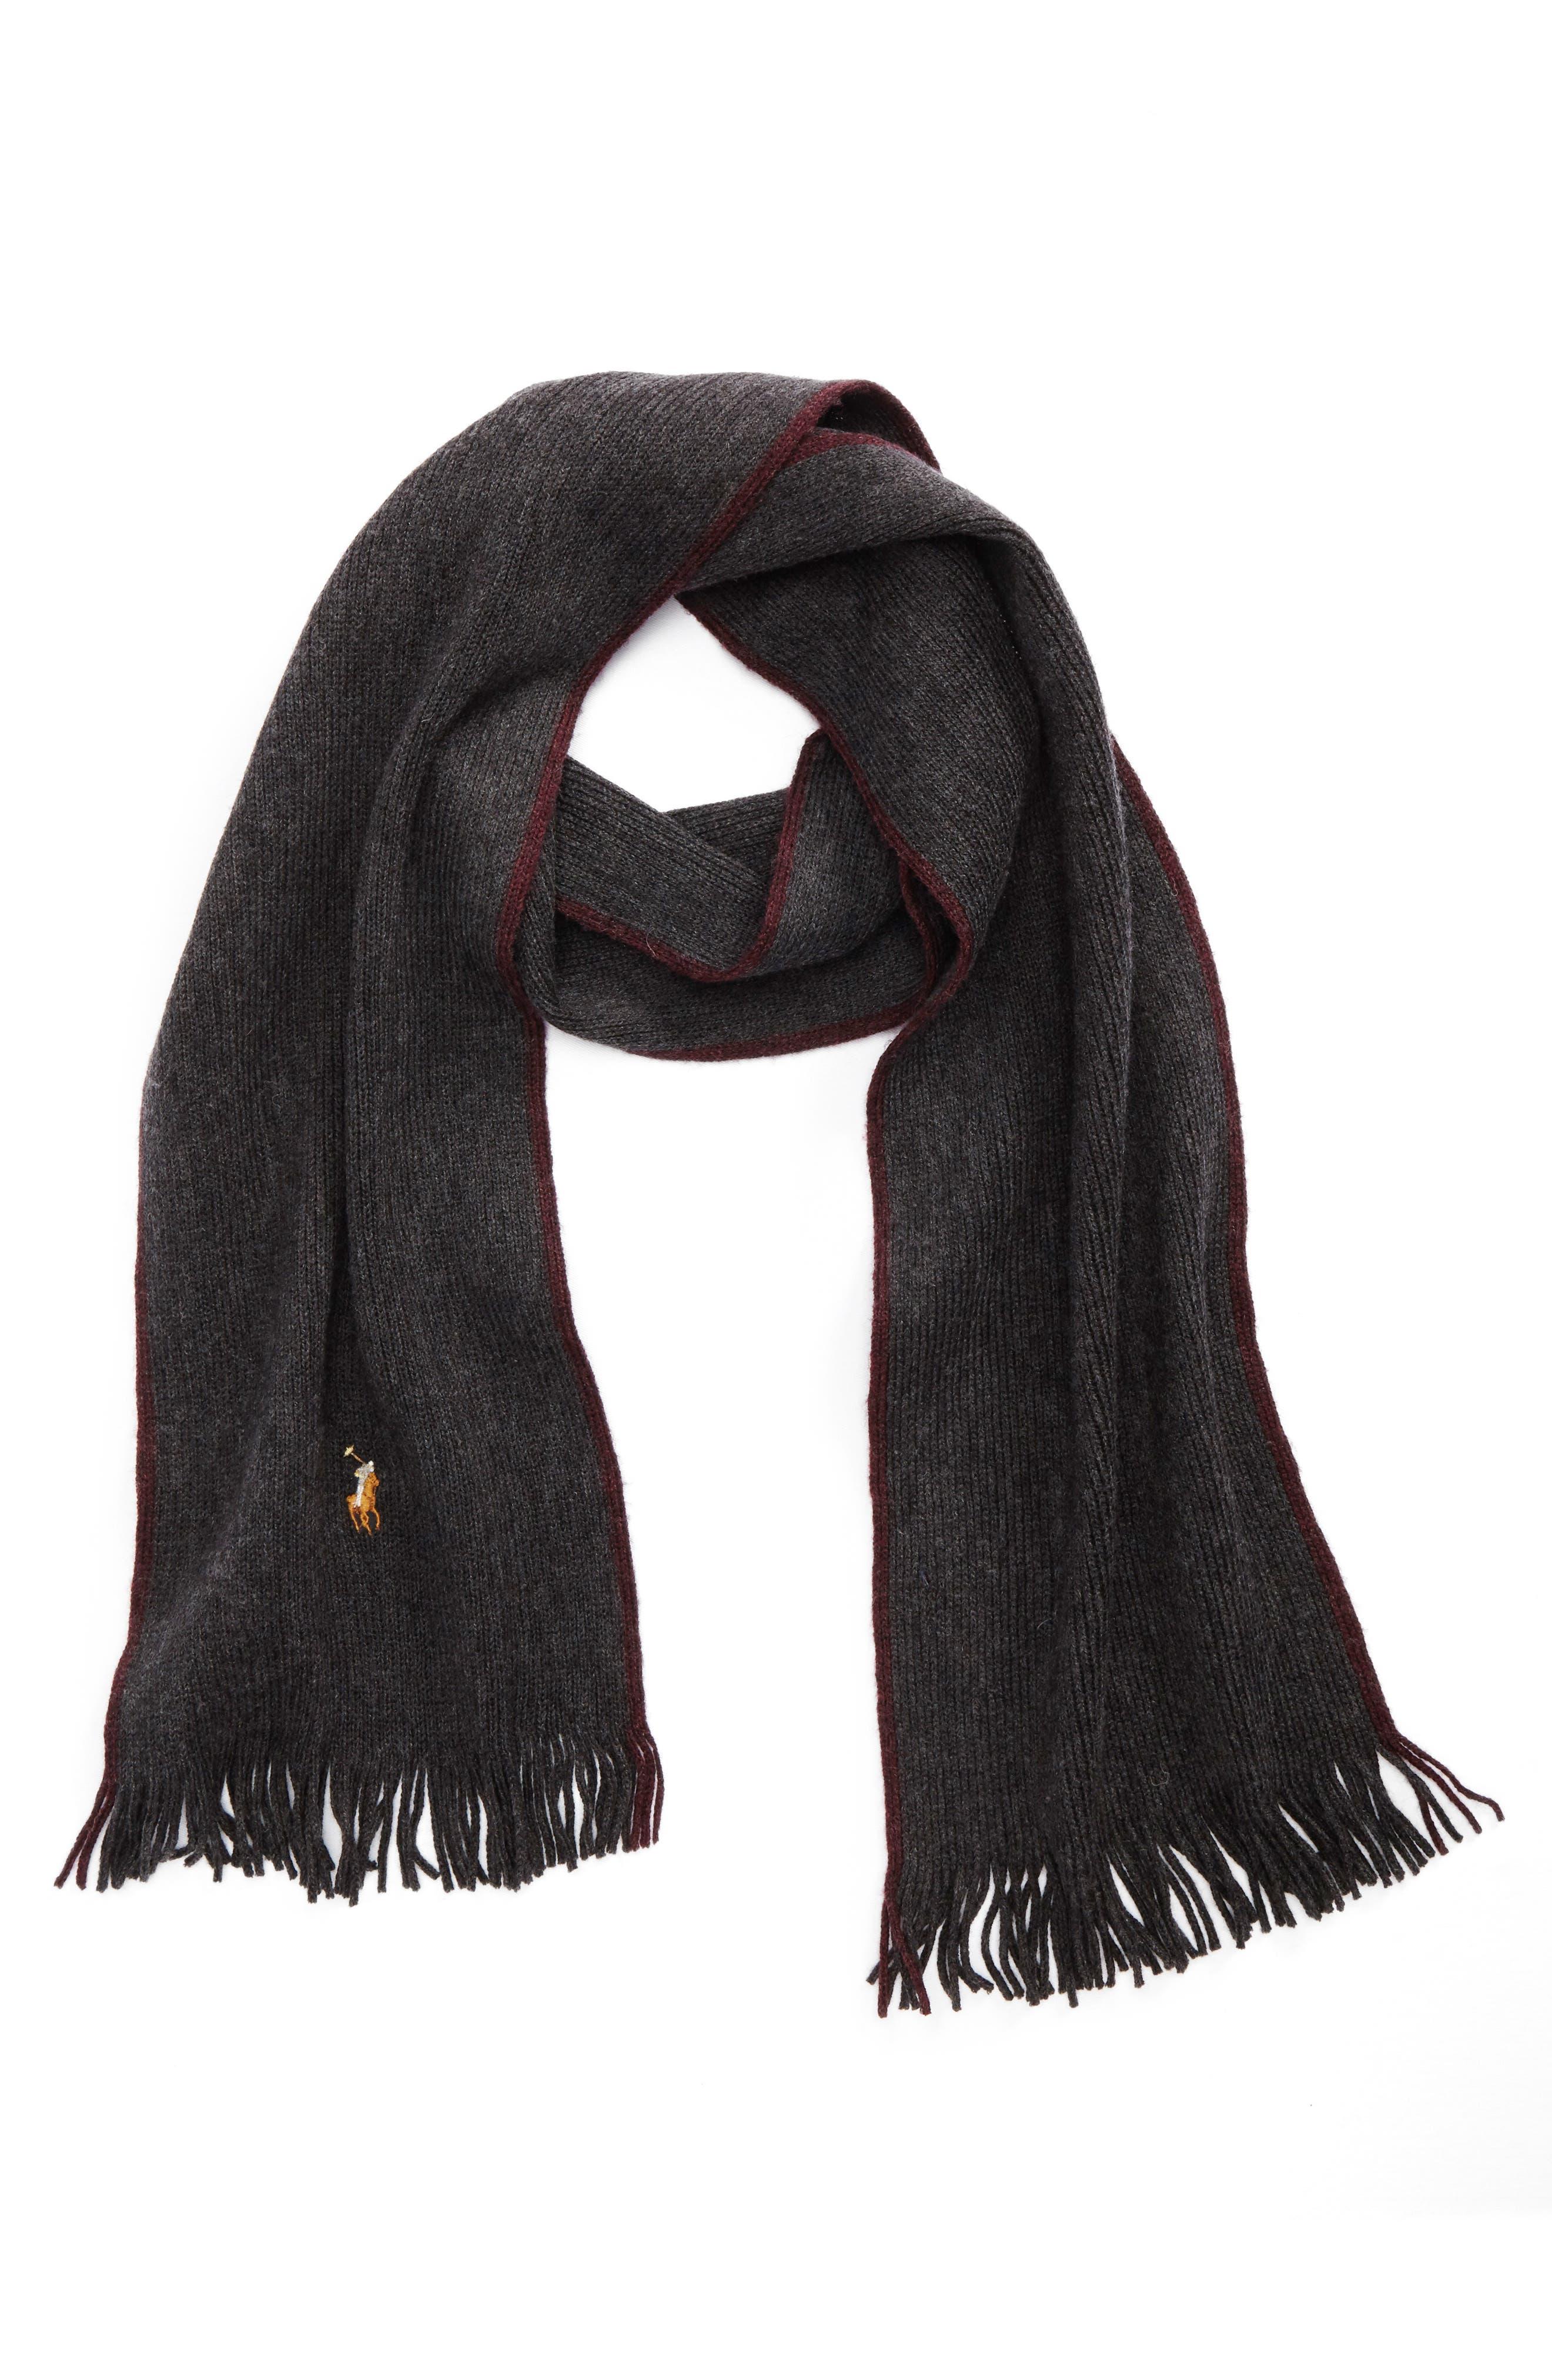 Polo Ralph Lauren Merino Wool Scarf